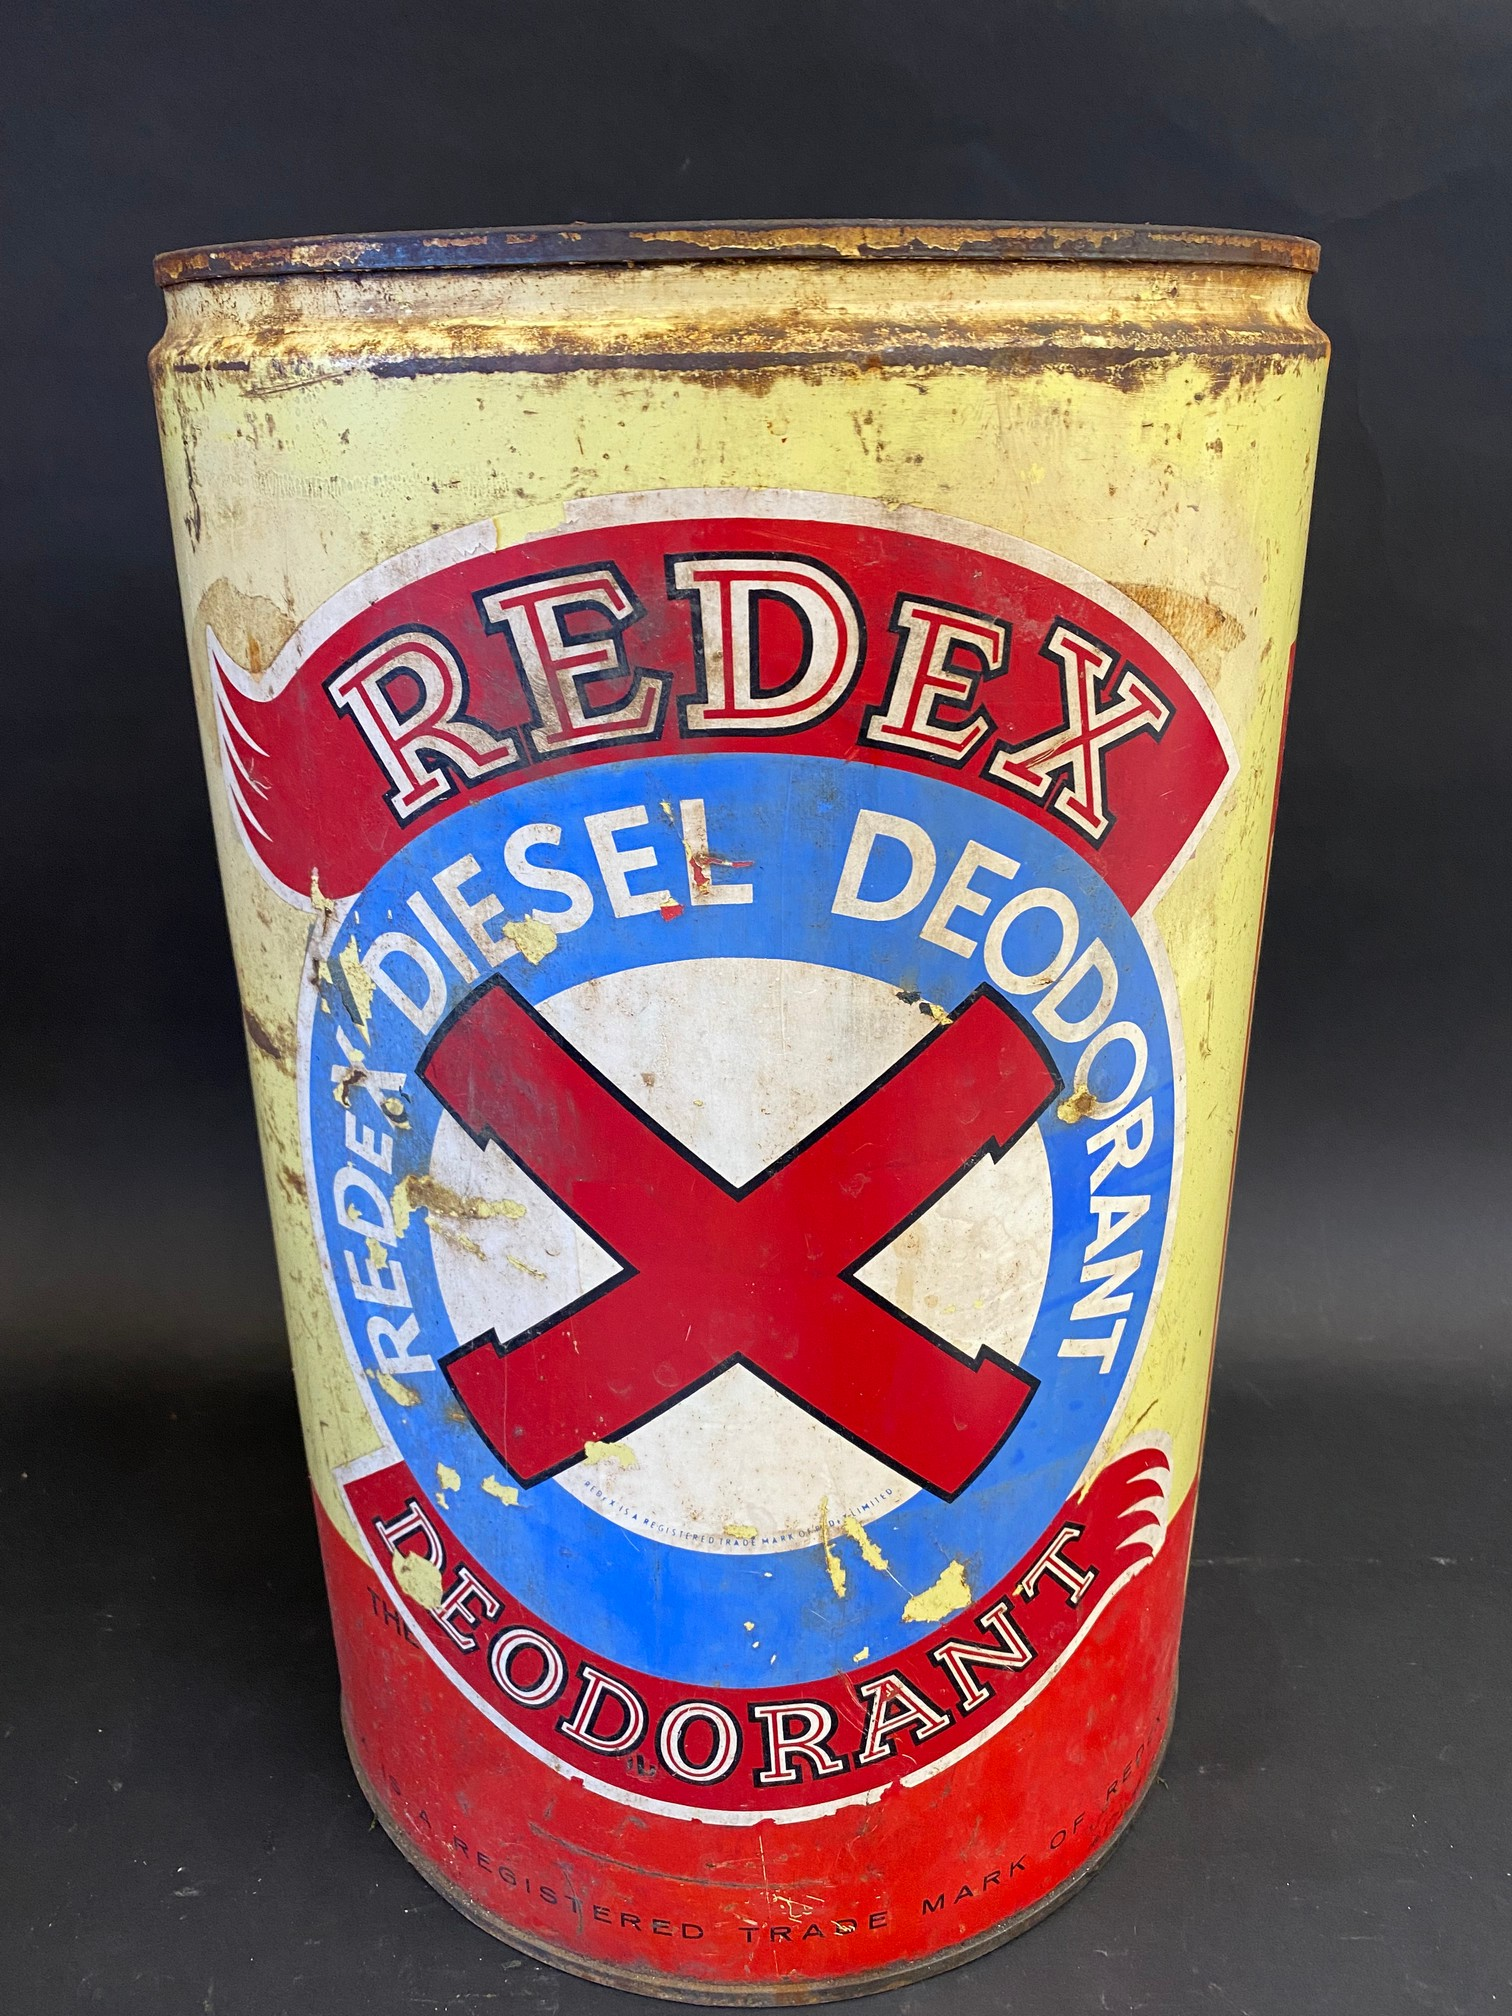 An unusual Redex five gallon drum for 'Redex Diesel Deodorant'.